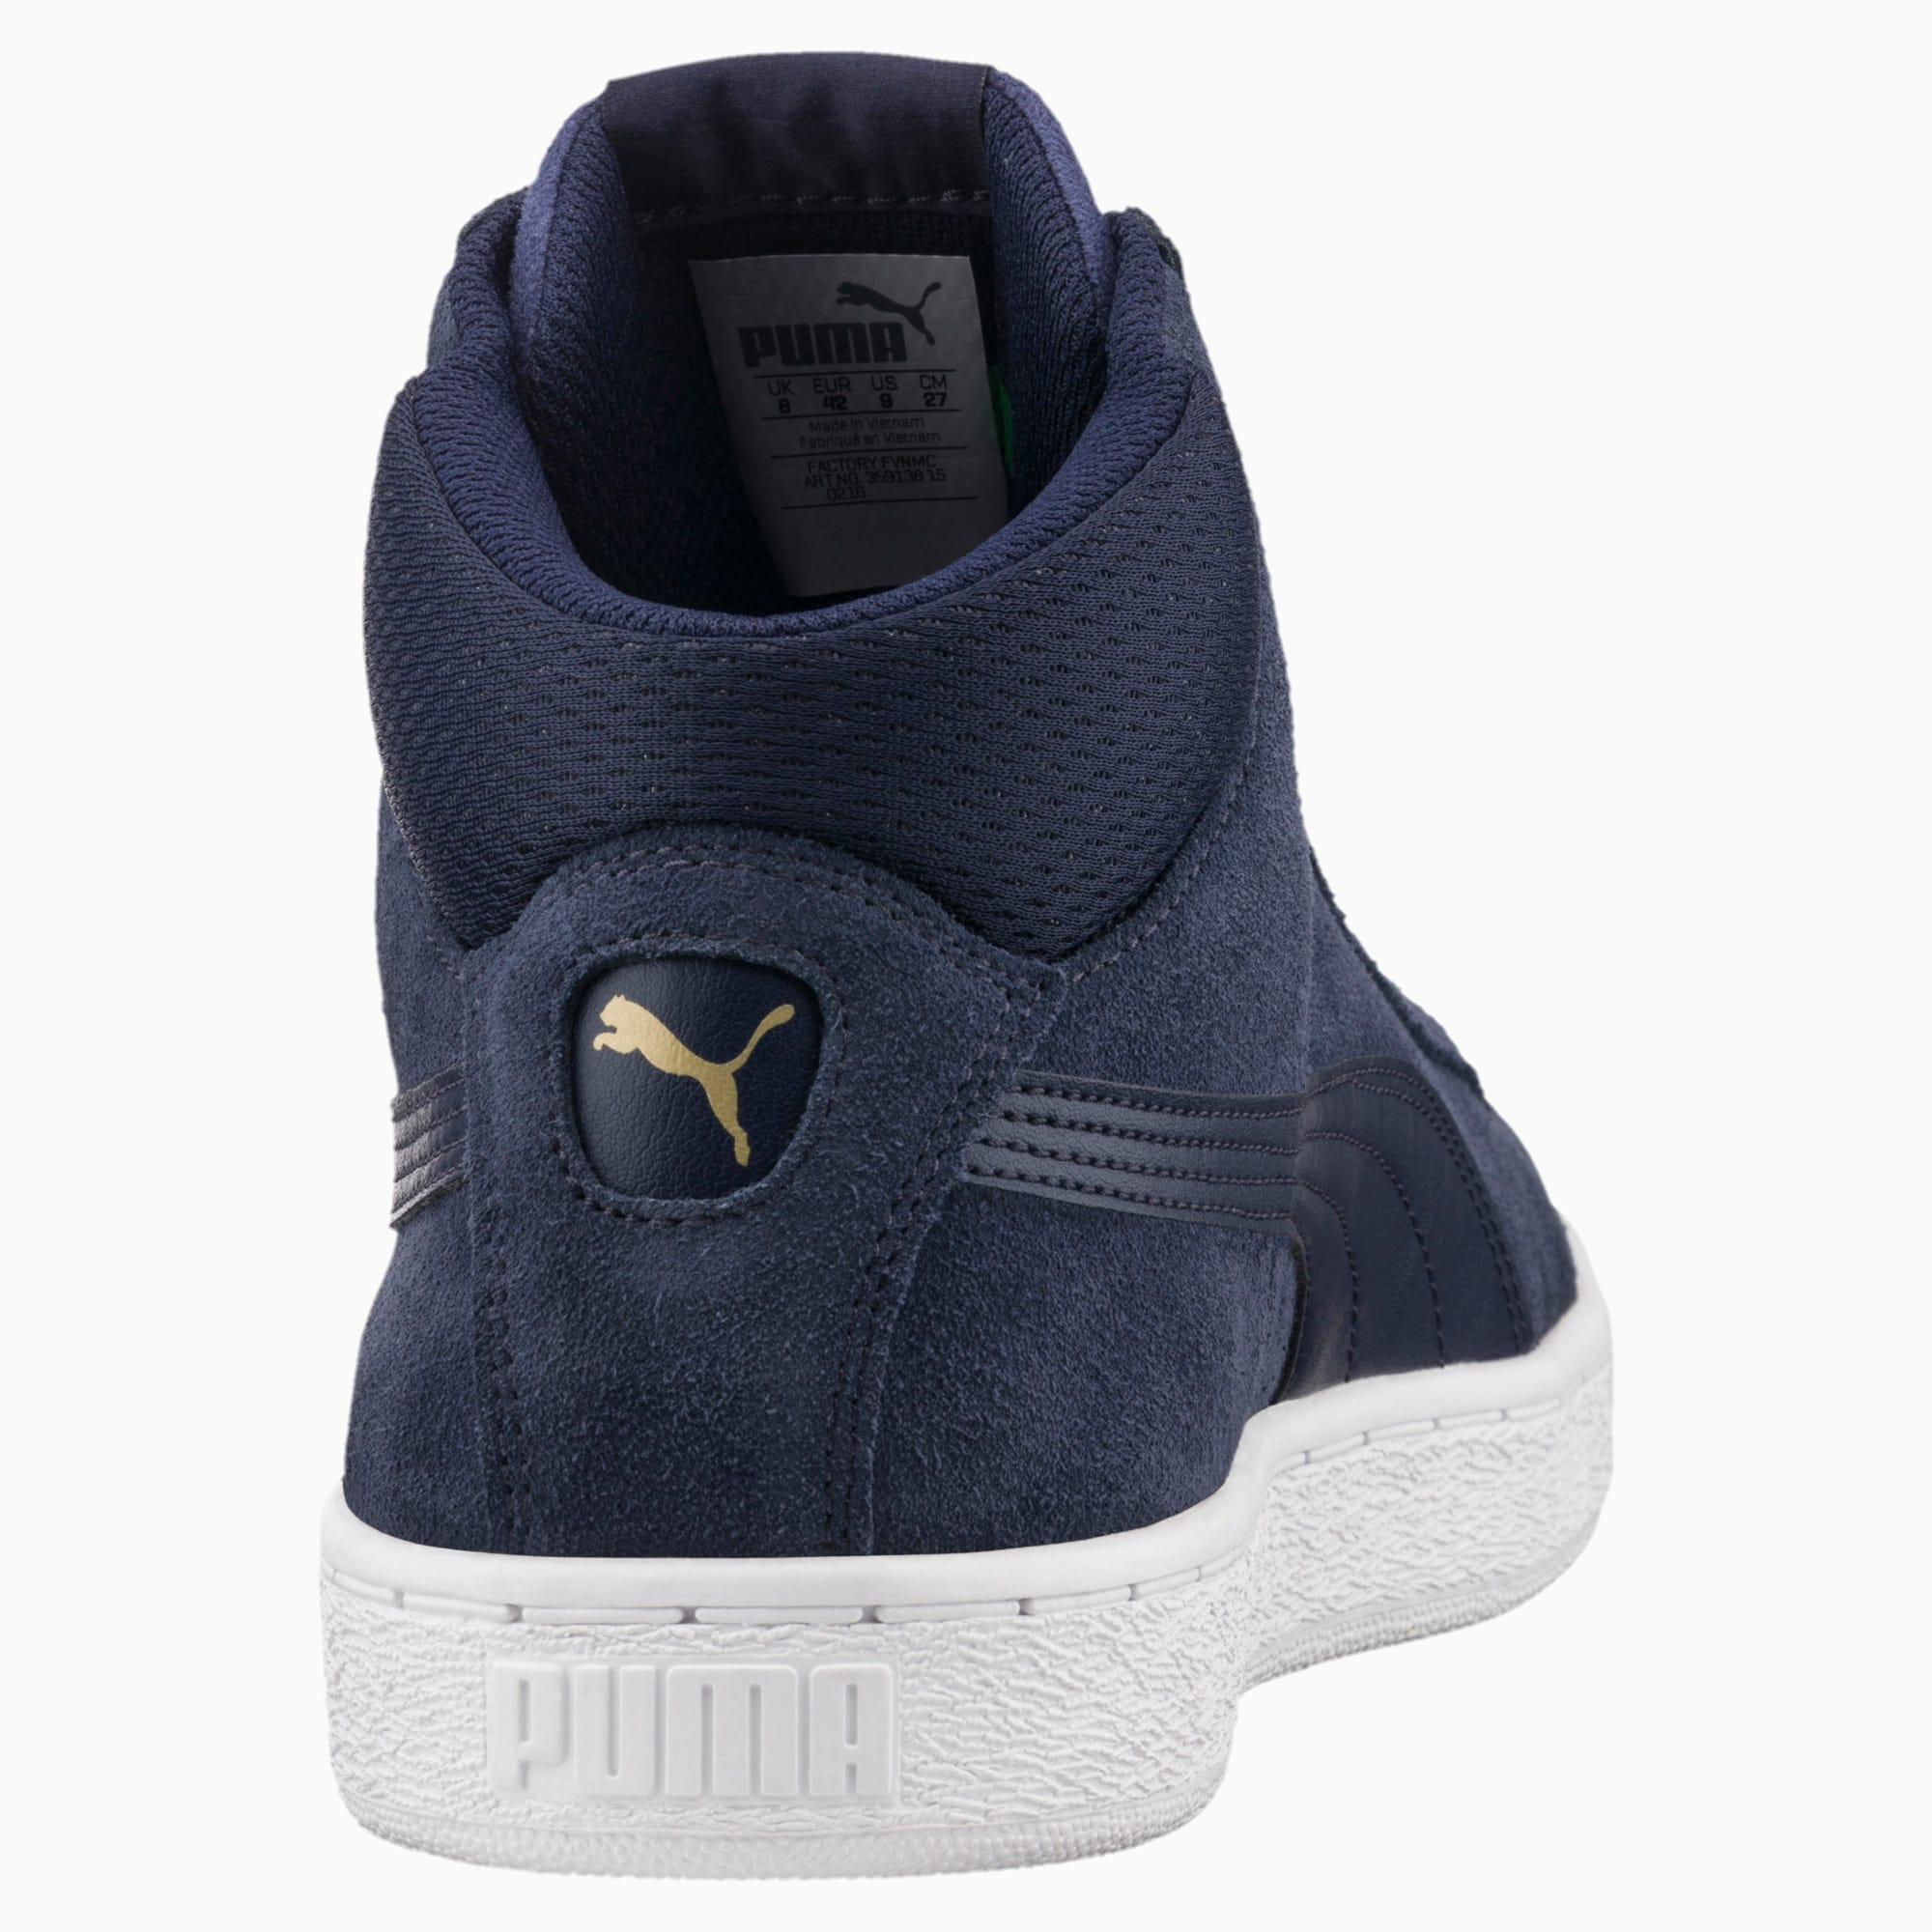 1948 Mid High Tops | PUMA Shoes | PUMA Italia